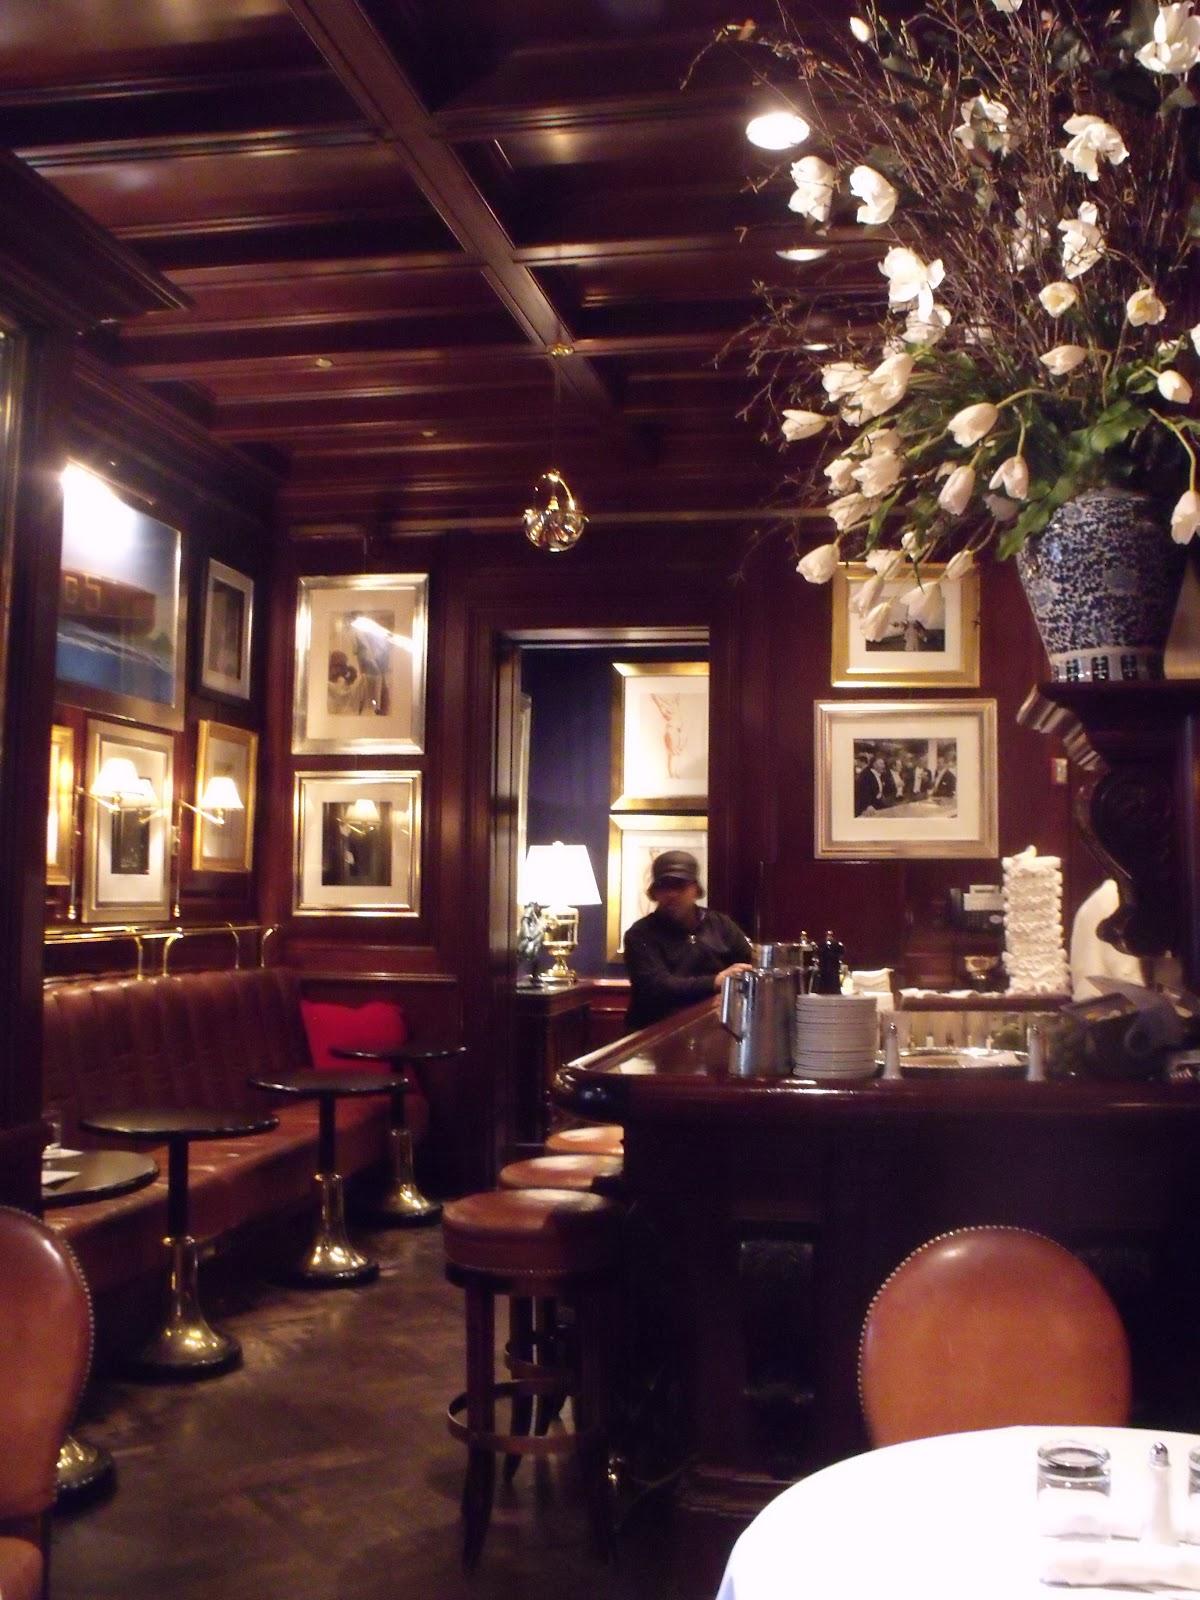 Find eat love ralph lauren restaurant review for The restaurant